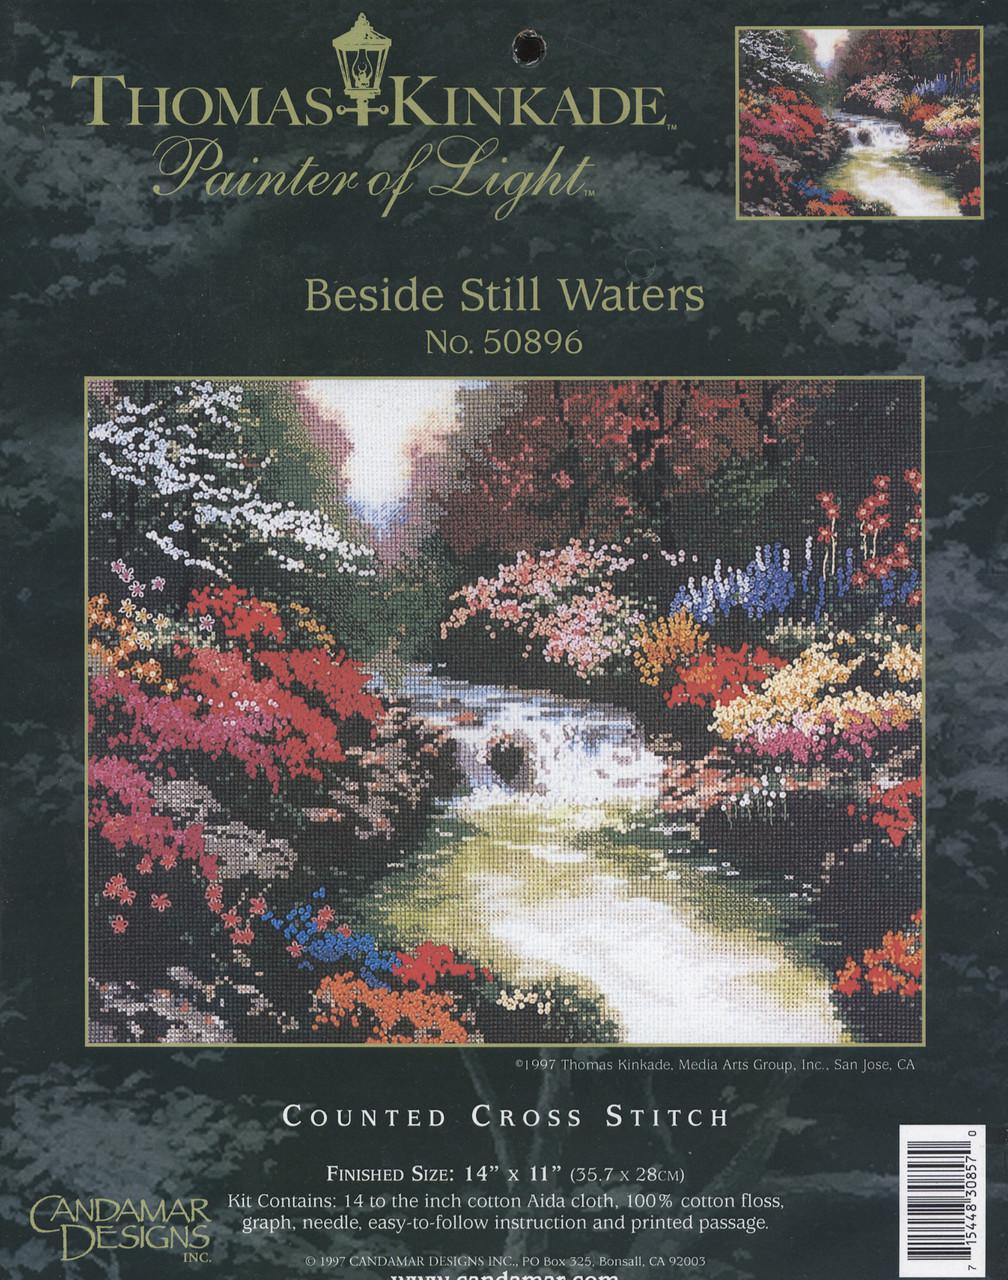 Candamar / Thomas Kinkade - Beside Still Waters